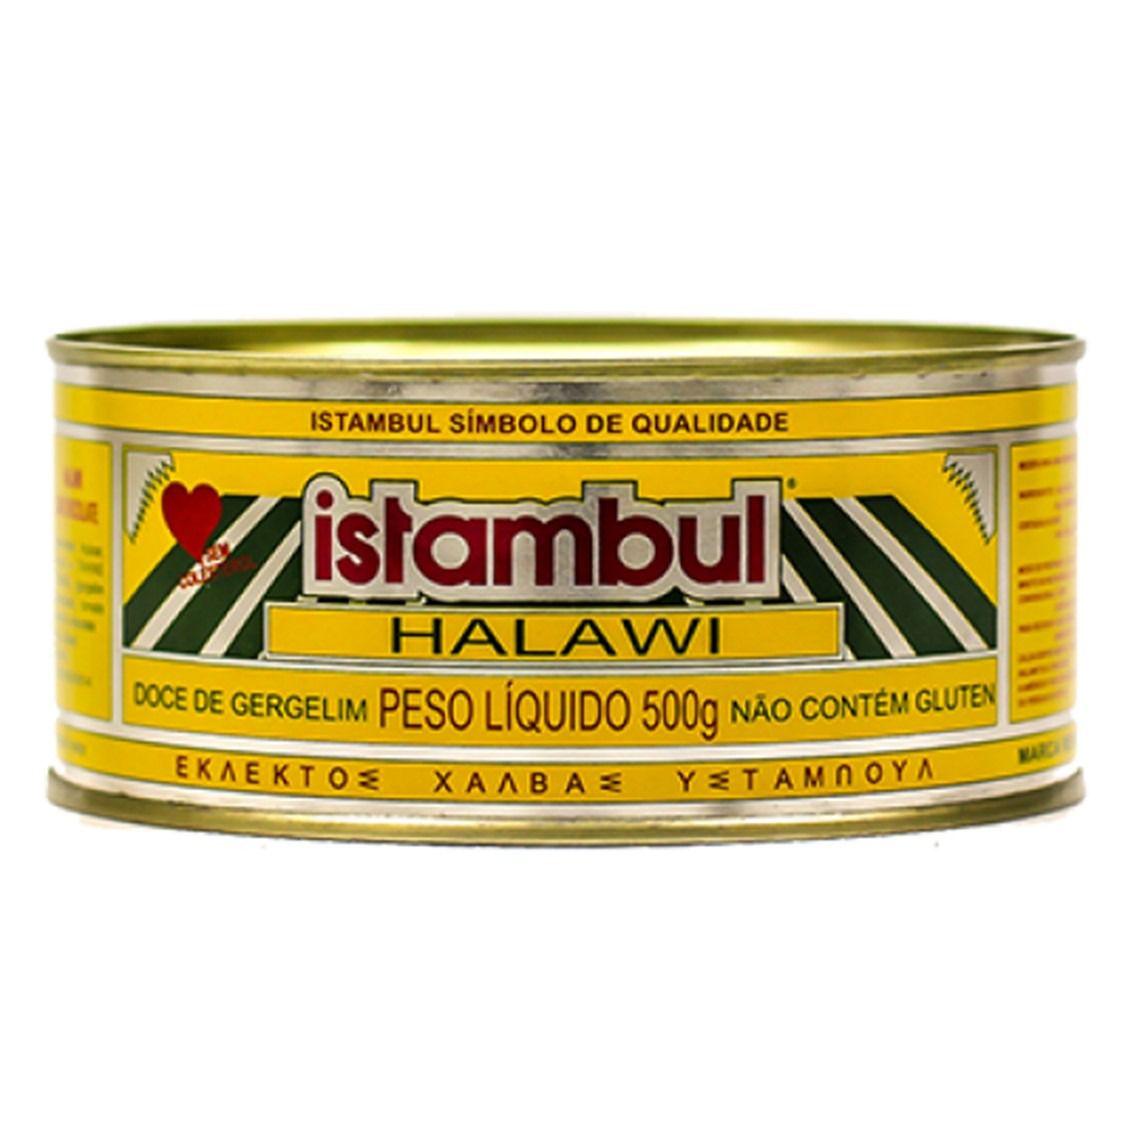 HALAWI ISTAMBUL DOCE DE GERGELIM  500G